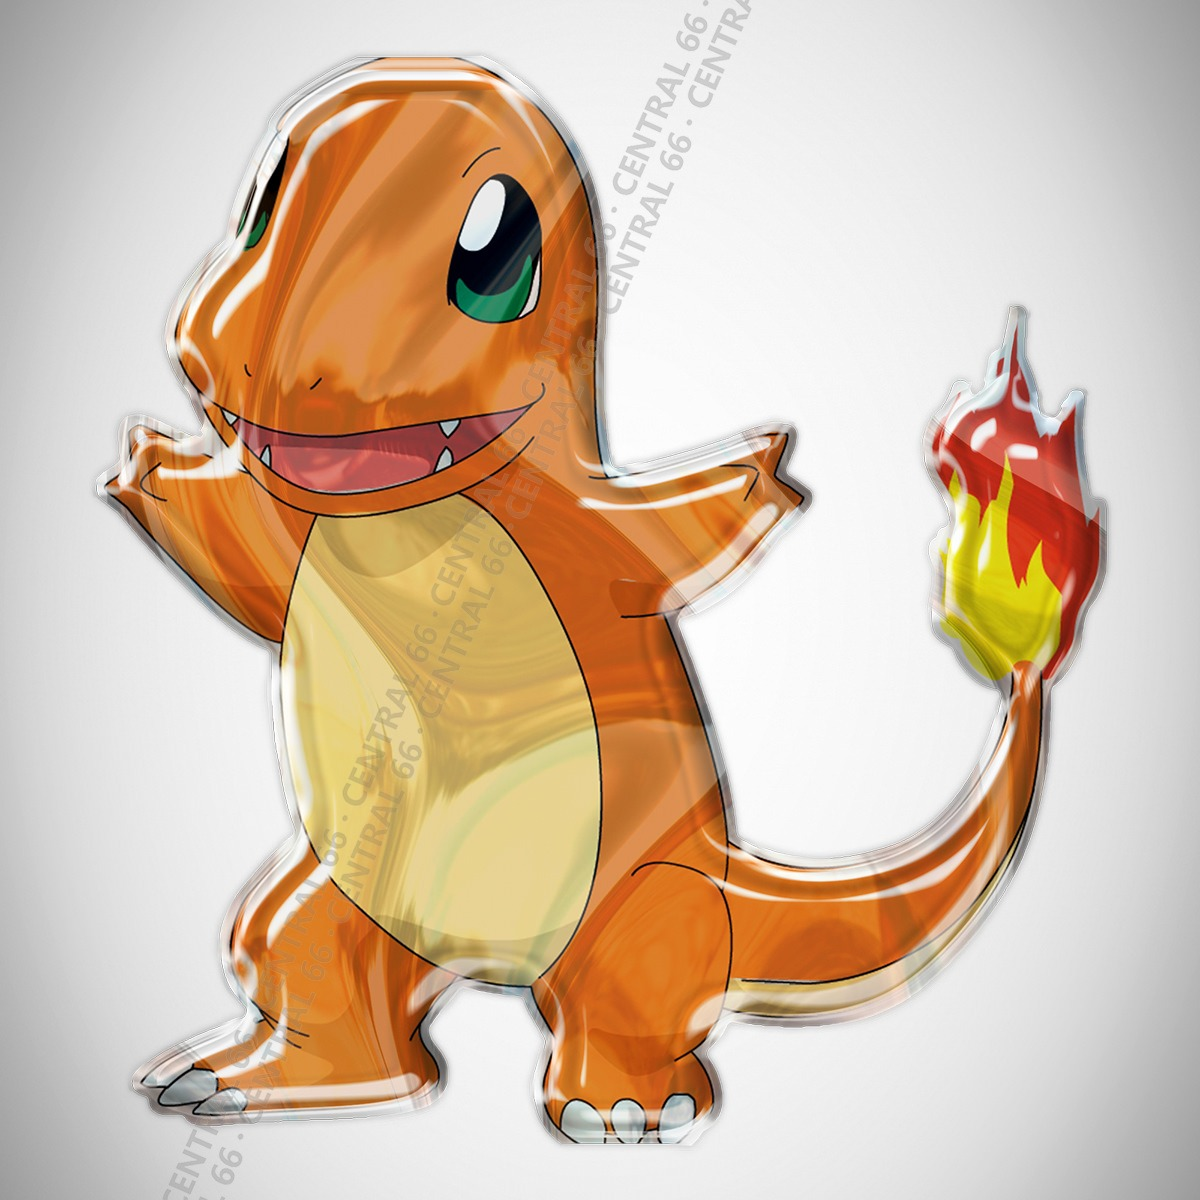 Adesivo Desenho Pokemon Charmander Resinado R 29 90 Em Mercado